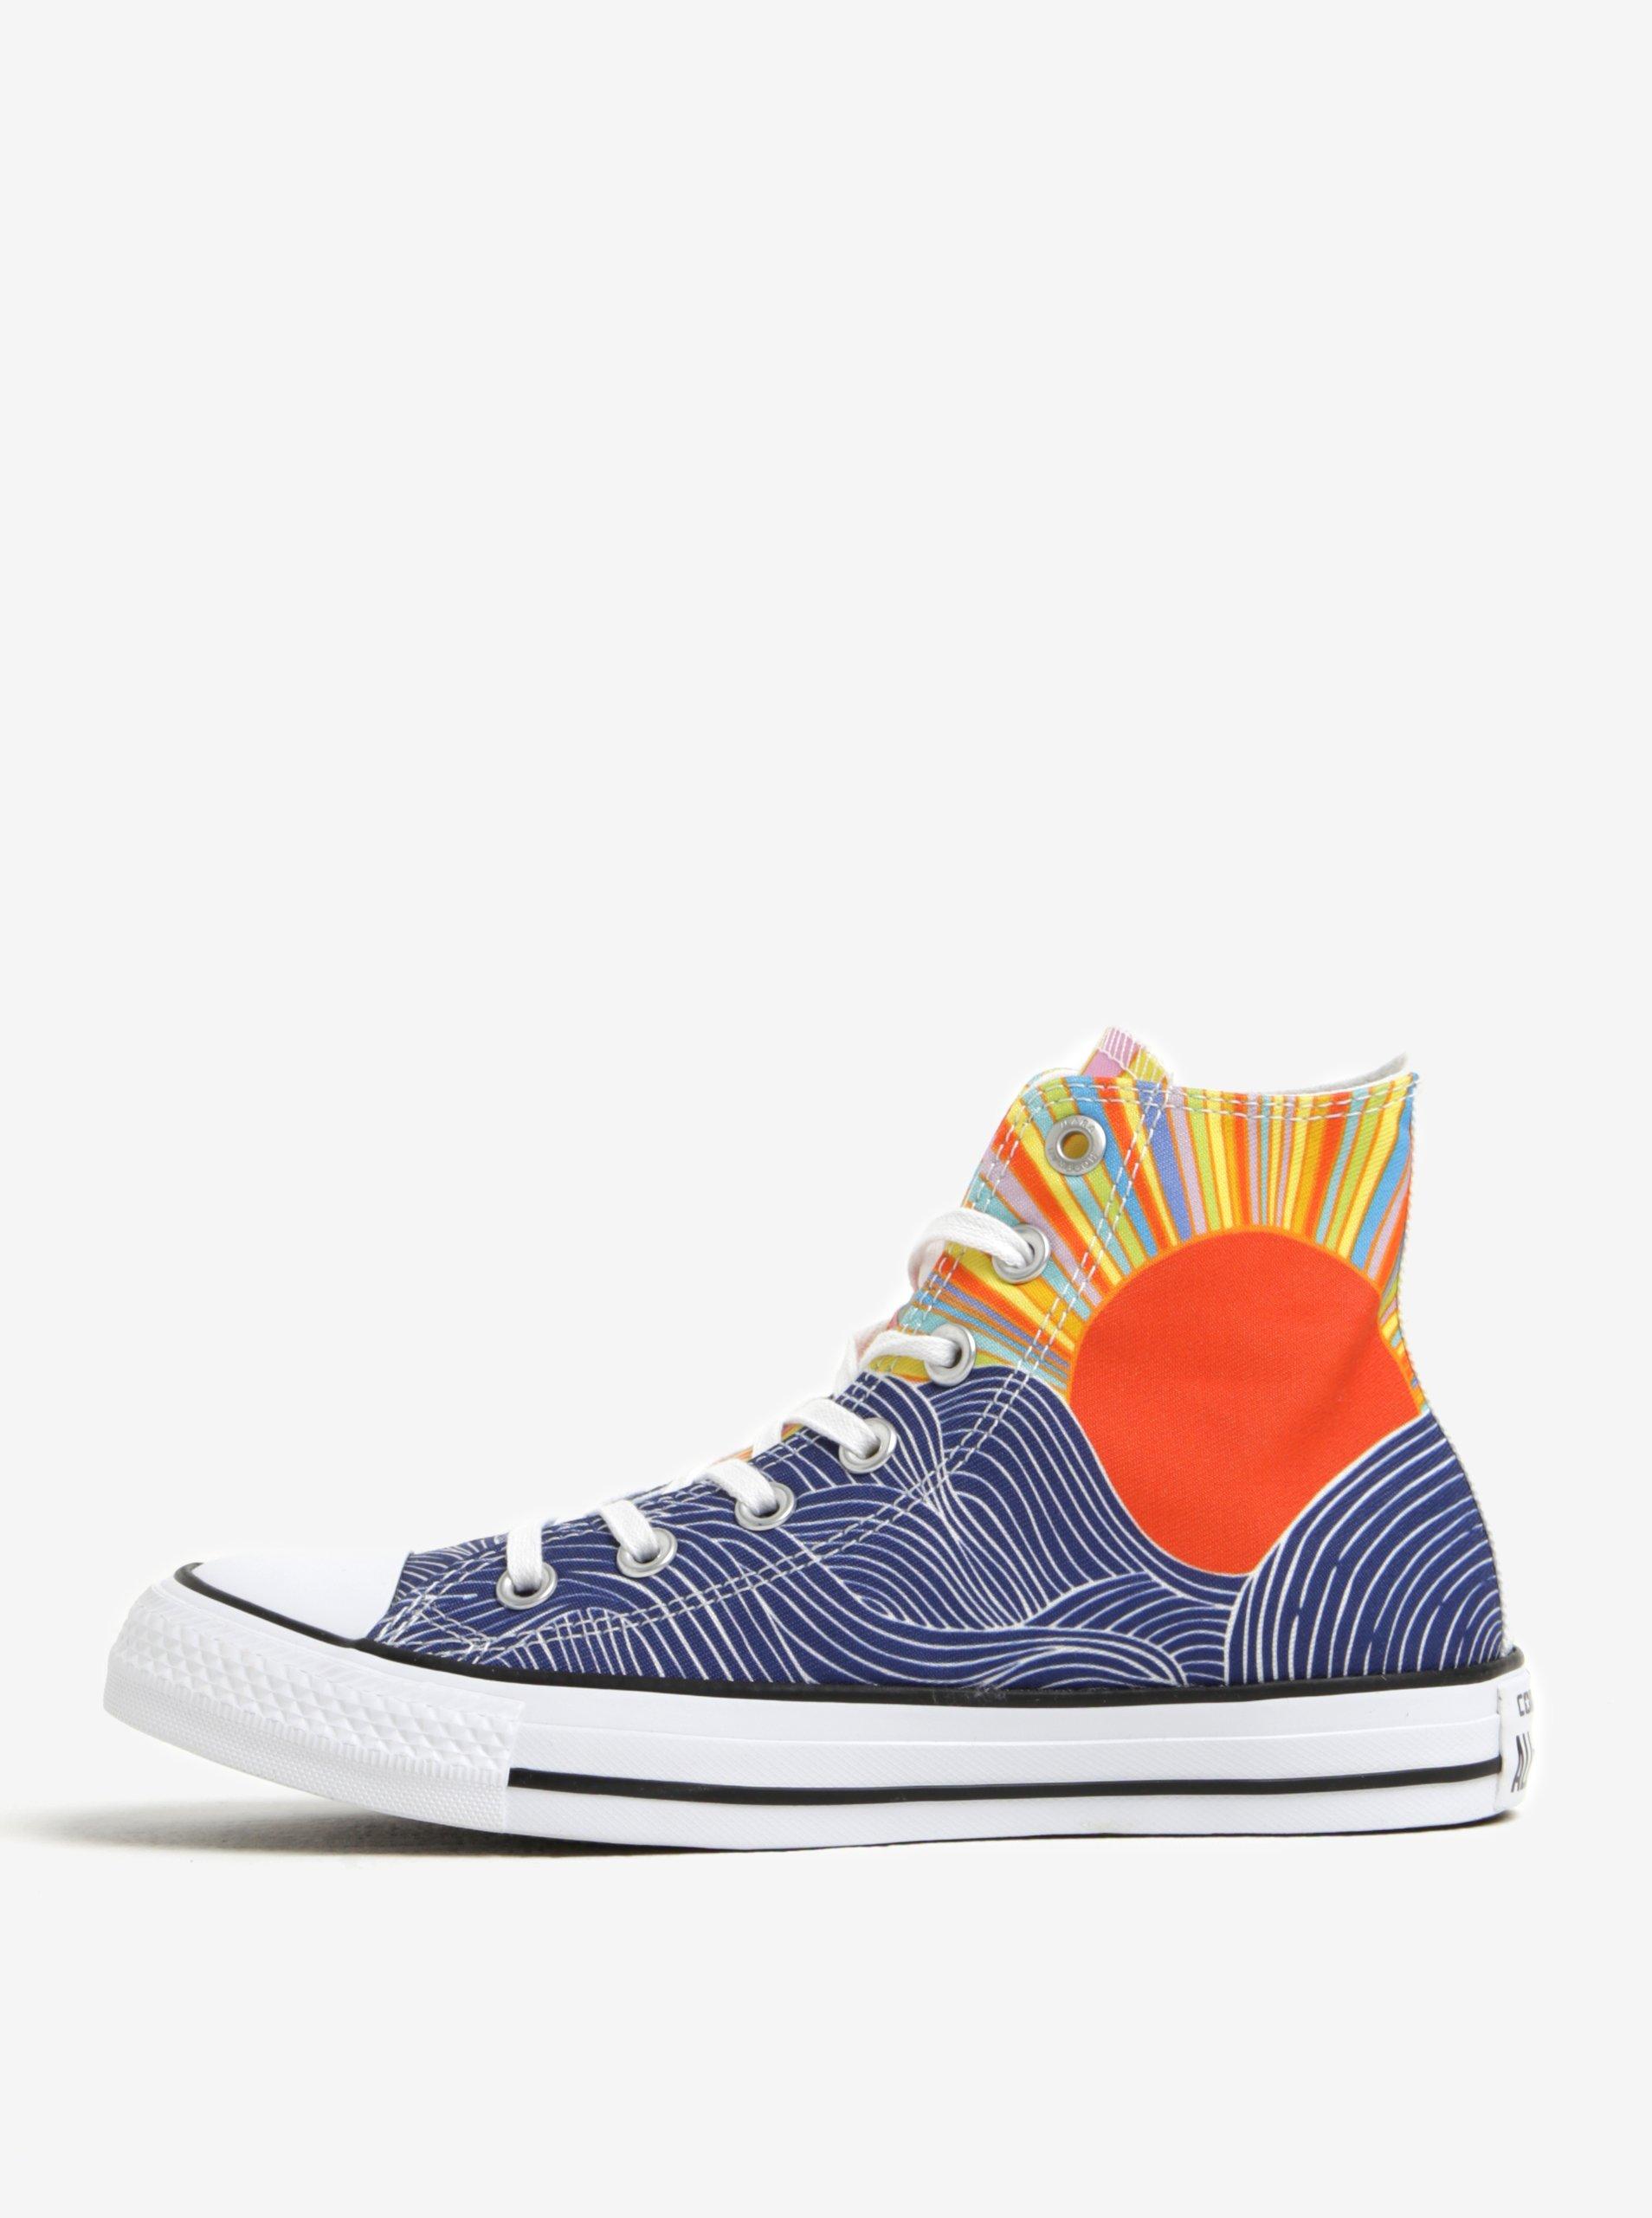 Modro-bílé vzorované dámské kotníkové tenisky Converse Chuck Taylor All Star